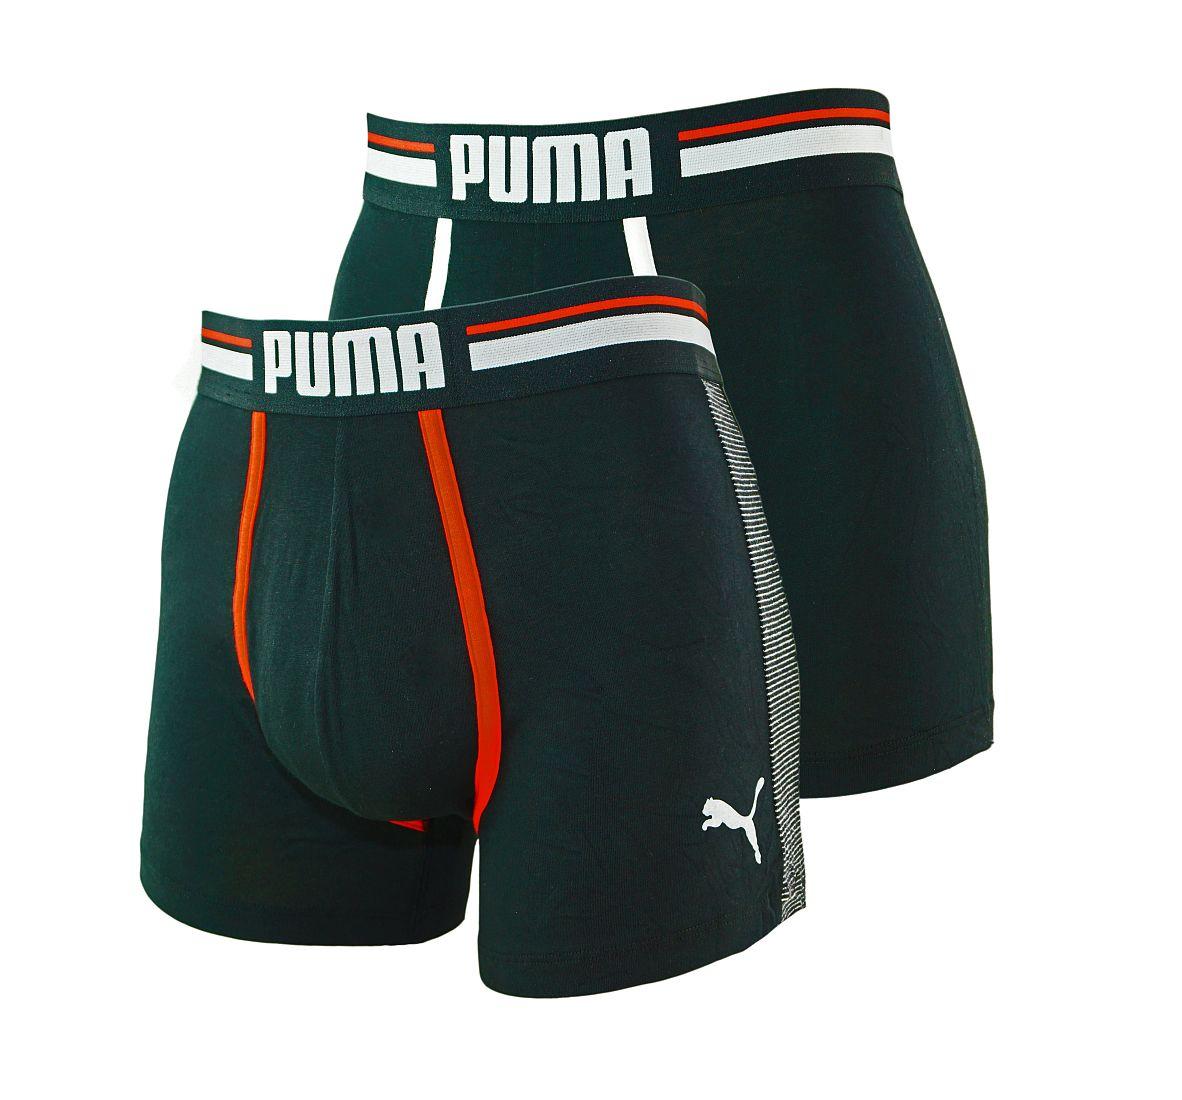 PUMA Shorts Unterhosen 2er Pack Boxer 571005001 200 020 black SF17-PMS1